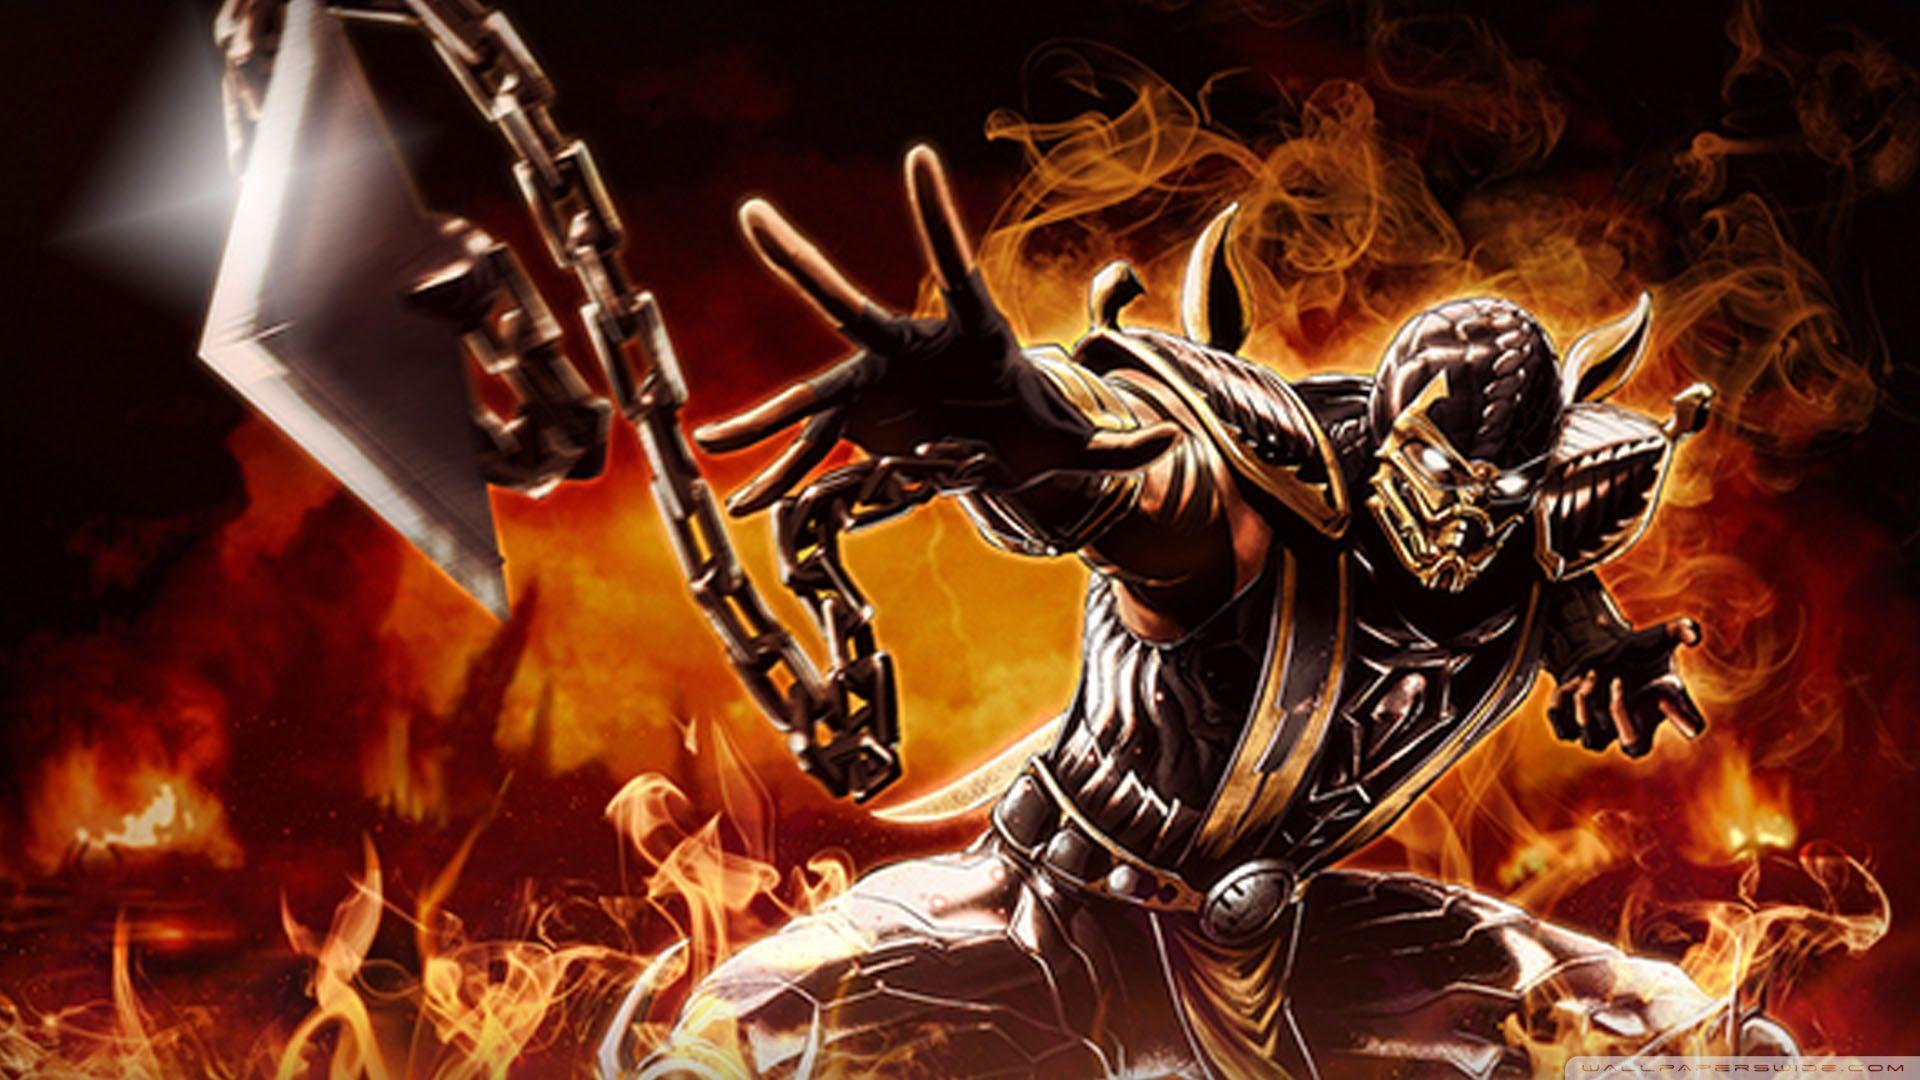 Best Wallpapers Scorpions Wallpapers 1920 1080 Scorpion Wallpaper 49 Wallpapers Adorable Scorpion Mortal Kombat Mortal Kombat Art Mortal Kombat X Scorpion